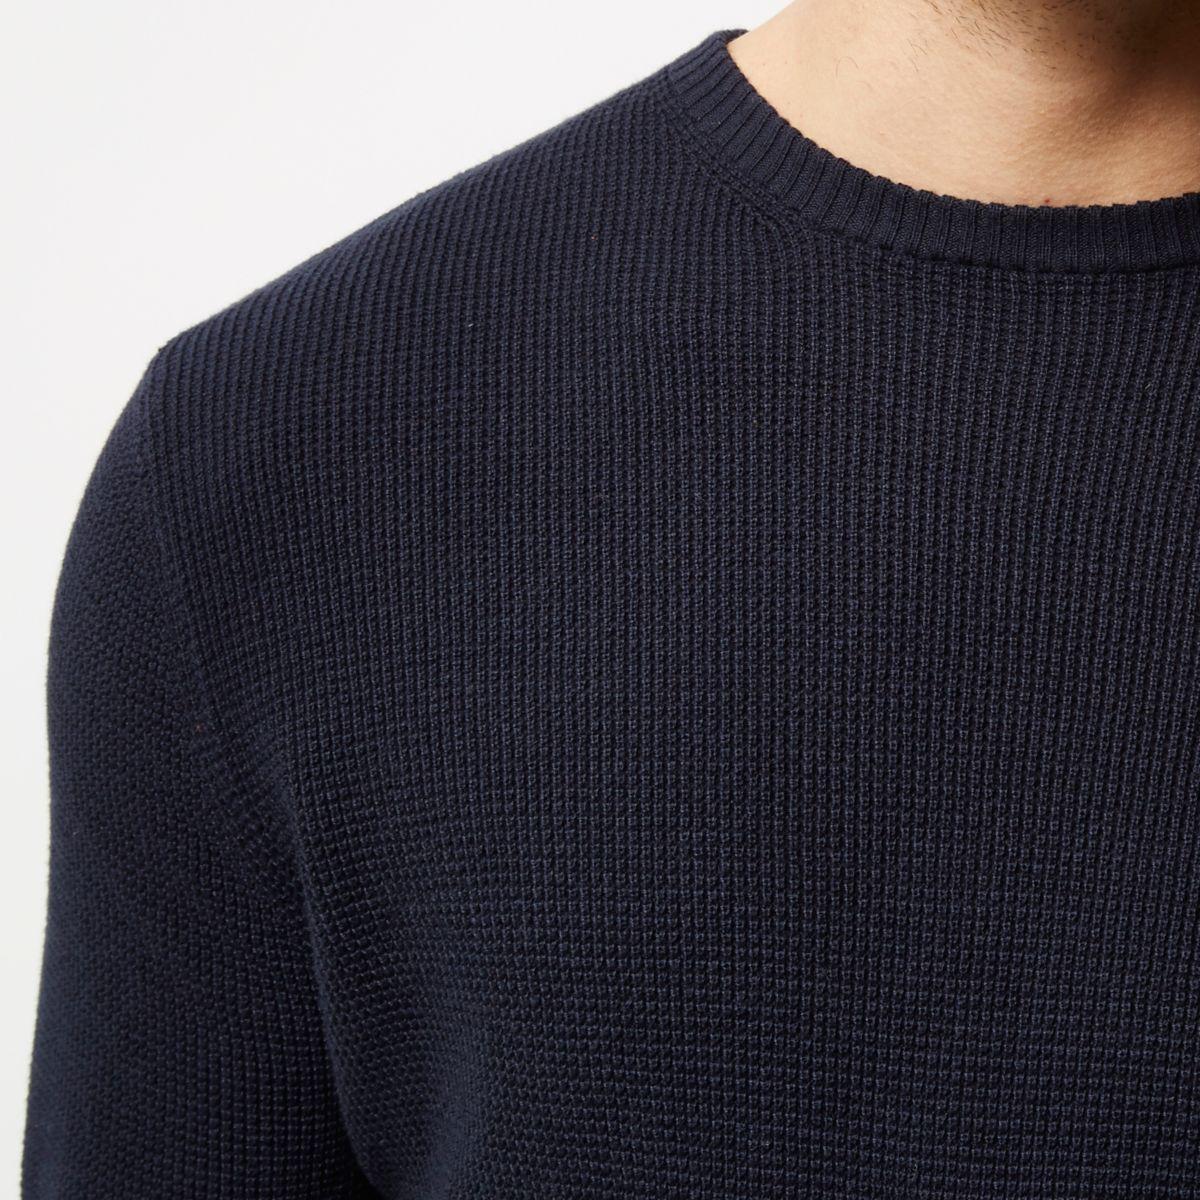 Navy textured jumper